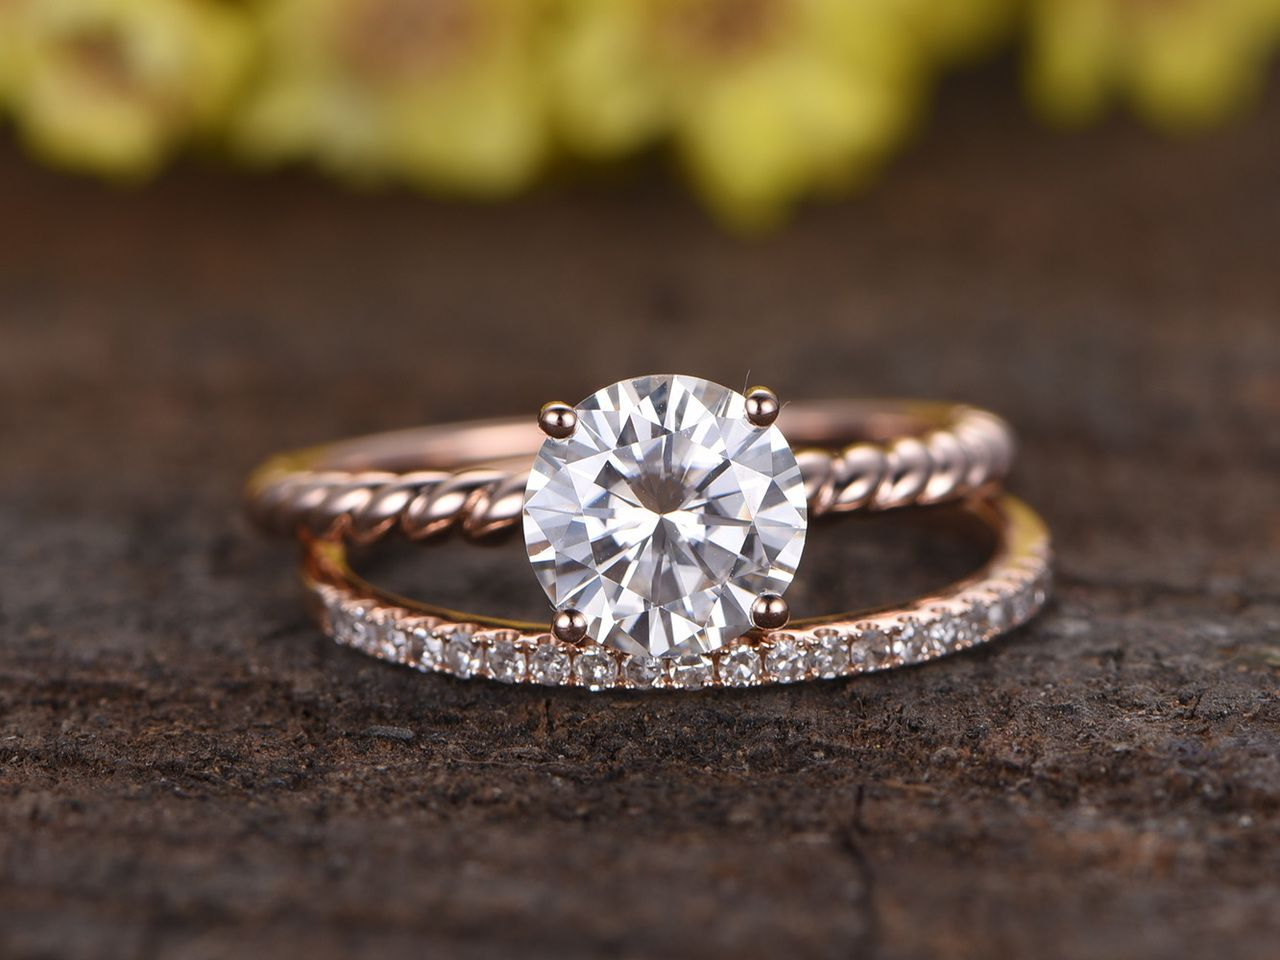 125 carat round moissanite solitaire engagement ring set